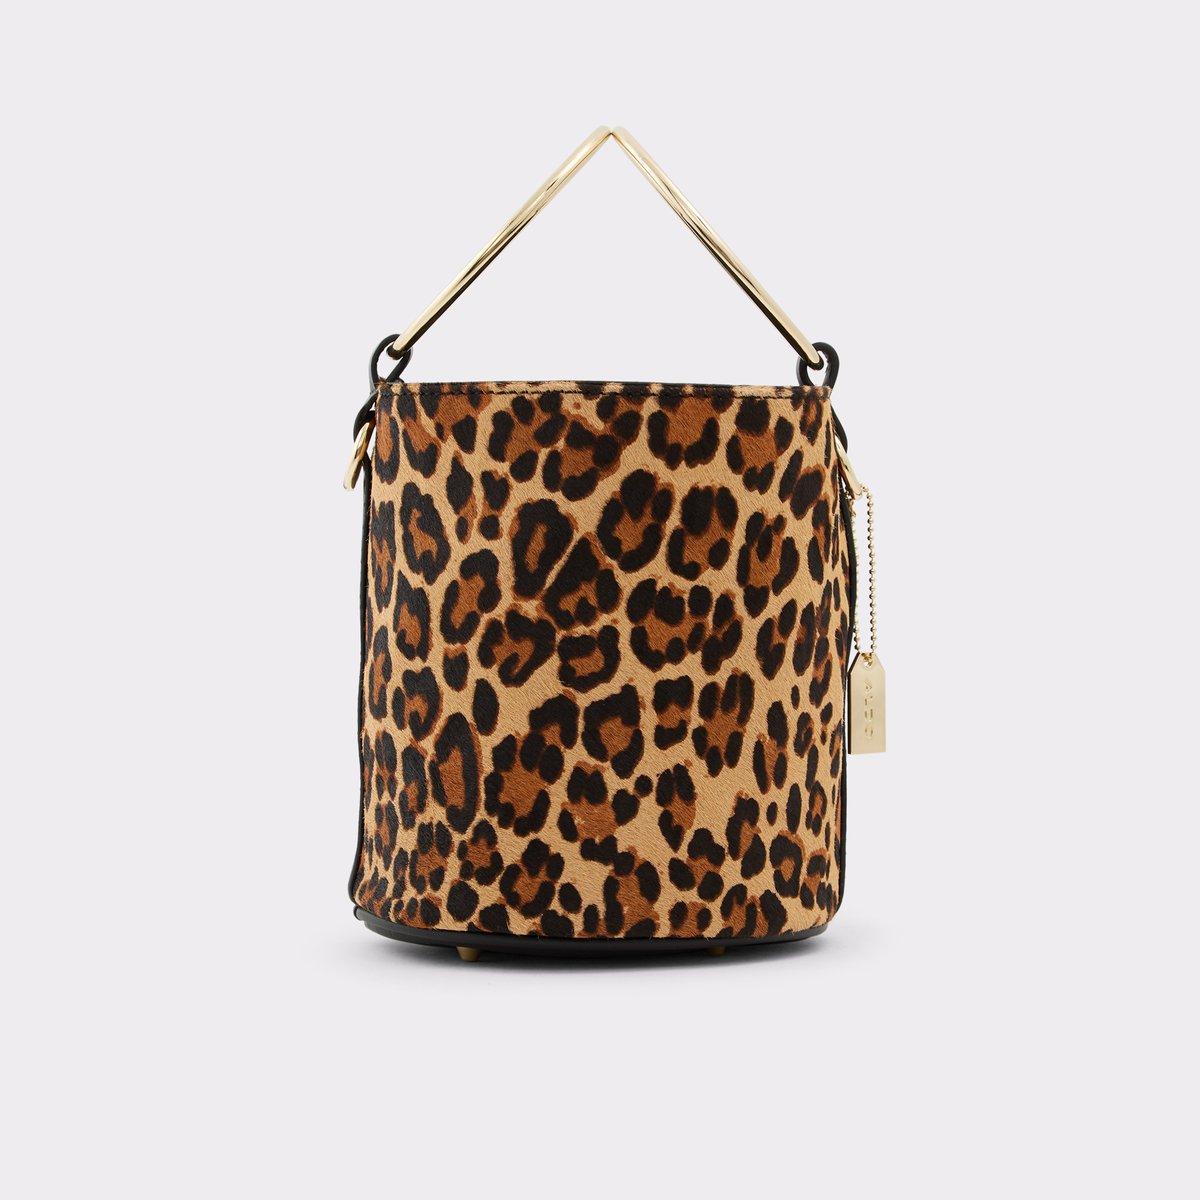 39a459bde27 Cadiawien Brown Misc. Women s Handbags